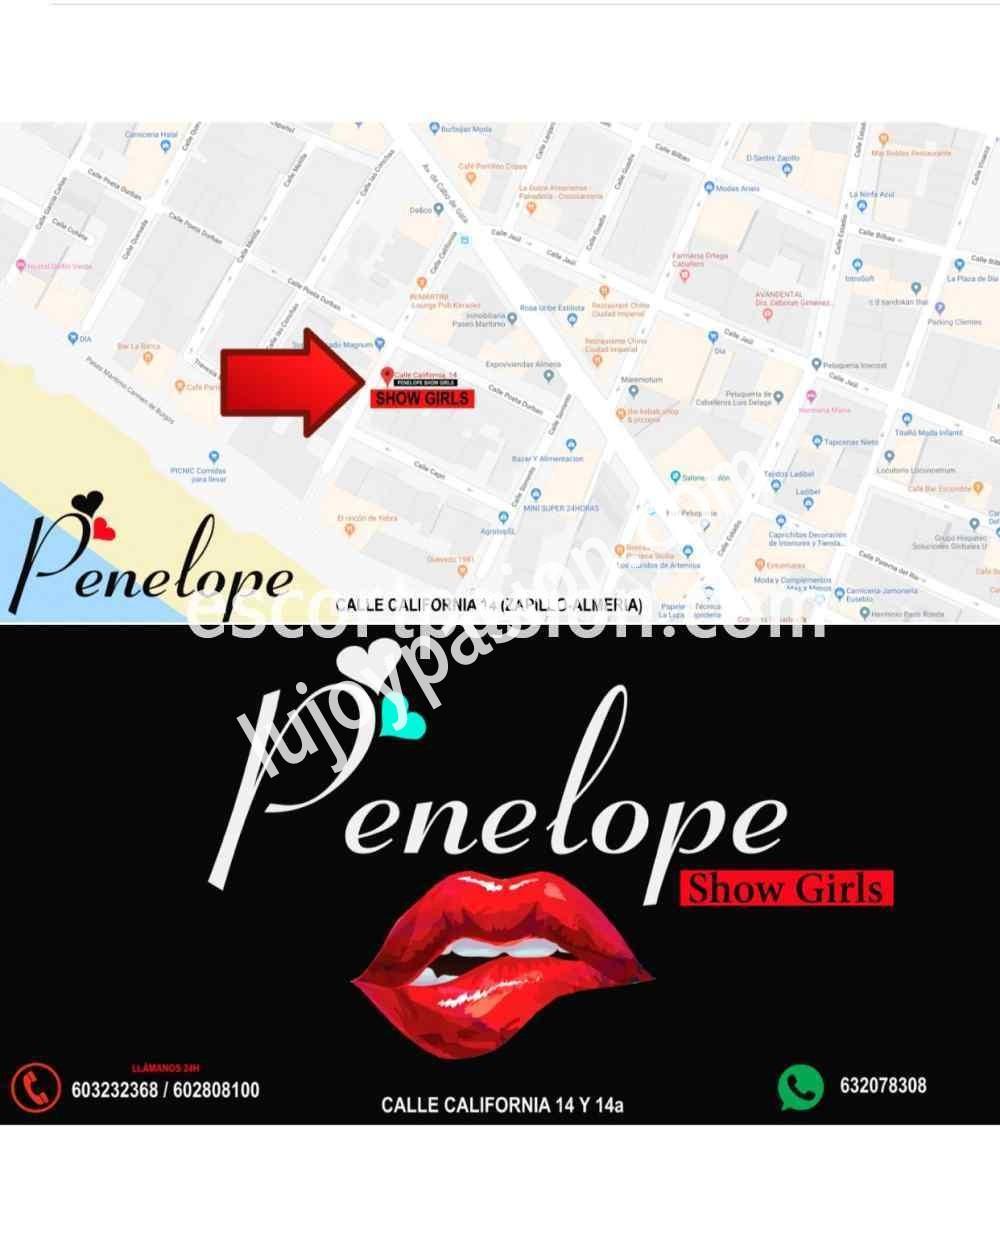 Club Penelope - Burdel en Barcelona